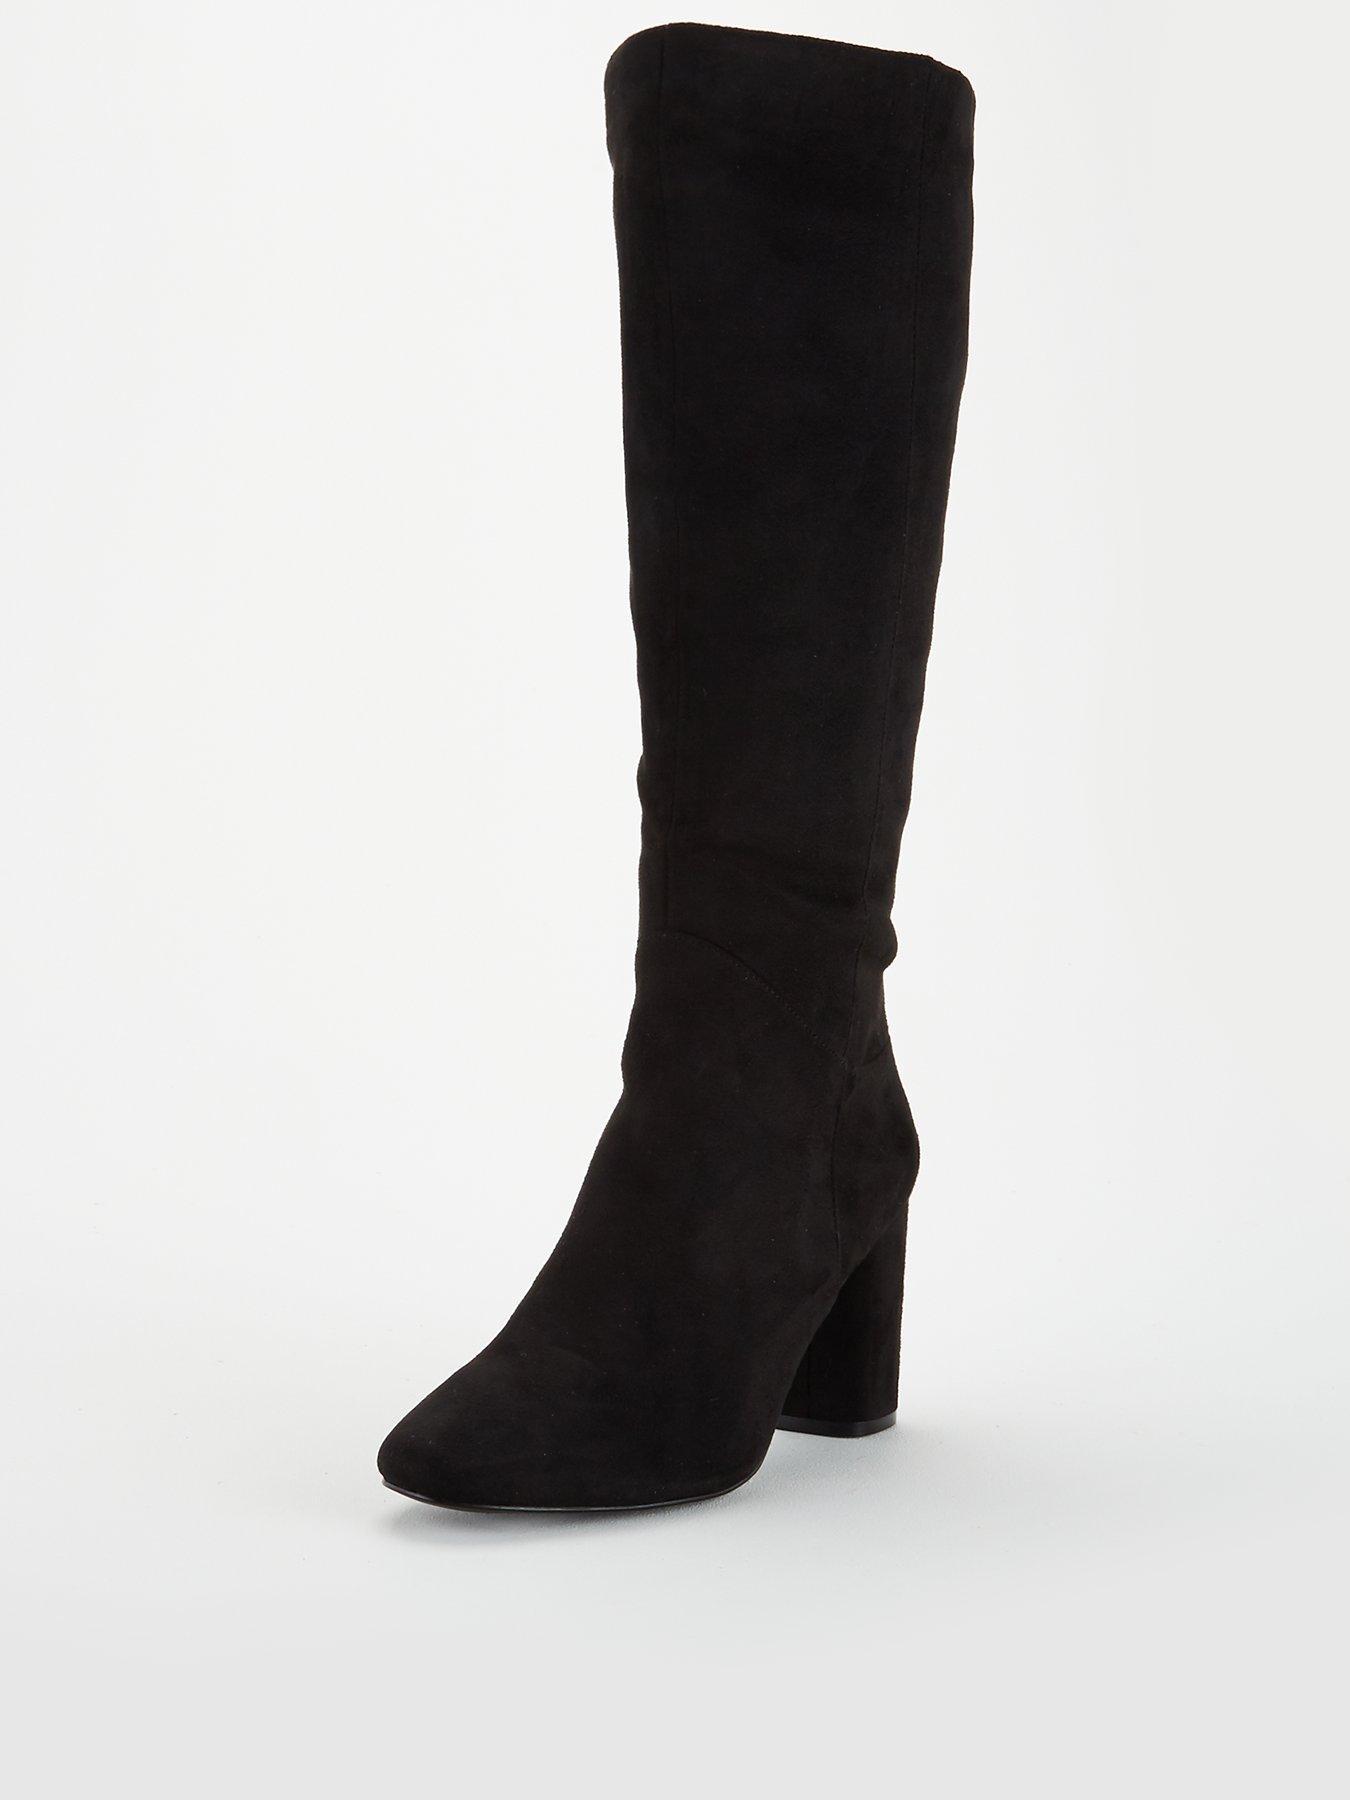 Black Boots for Women | Shop Womens